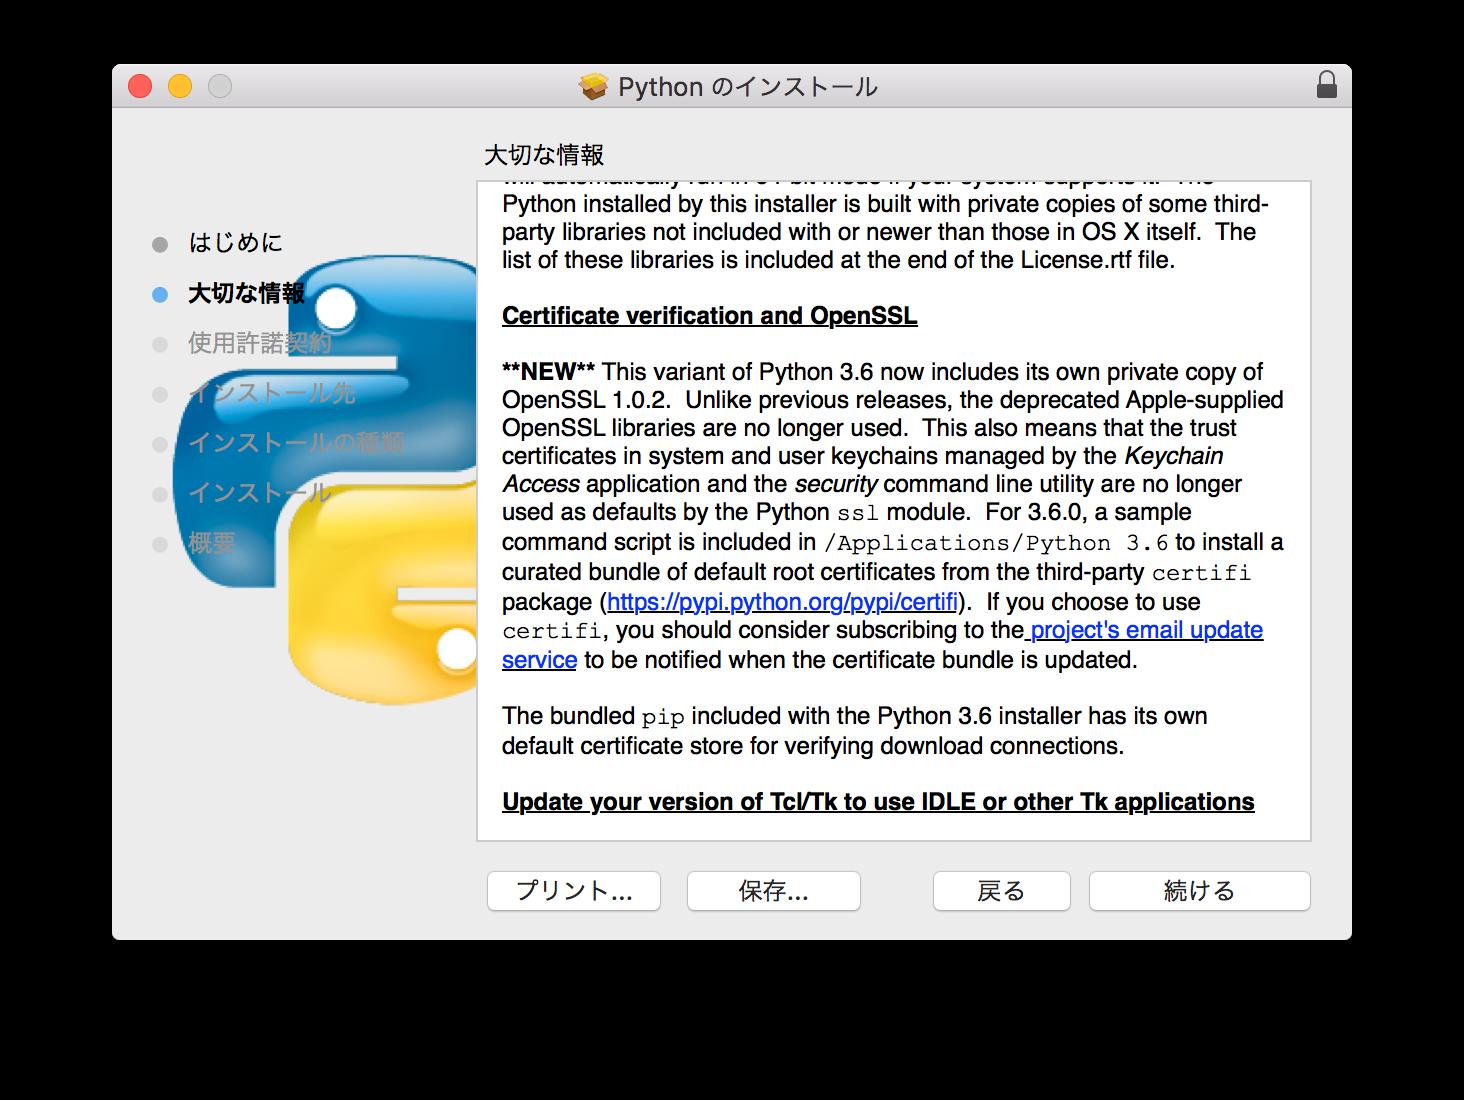 Pythonインストーラーの大切な情報